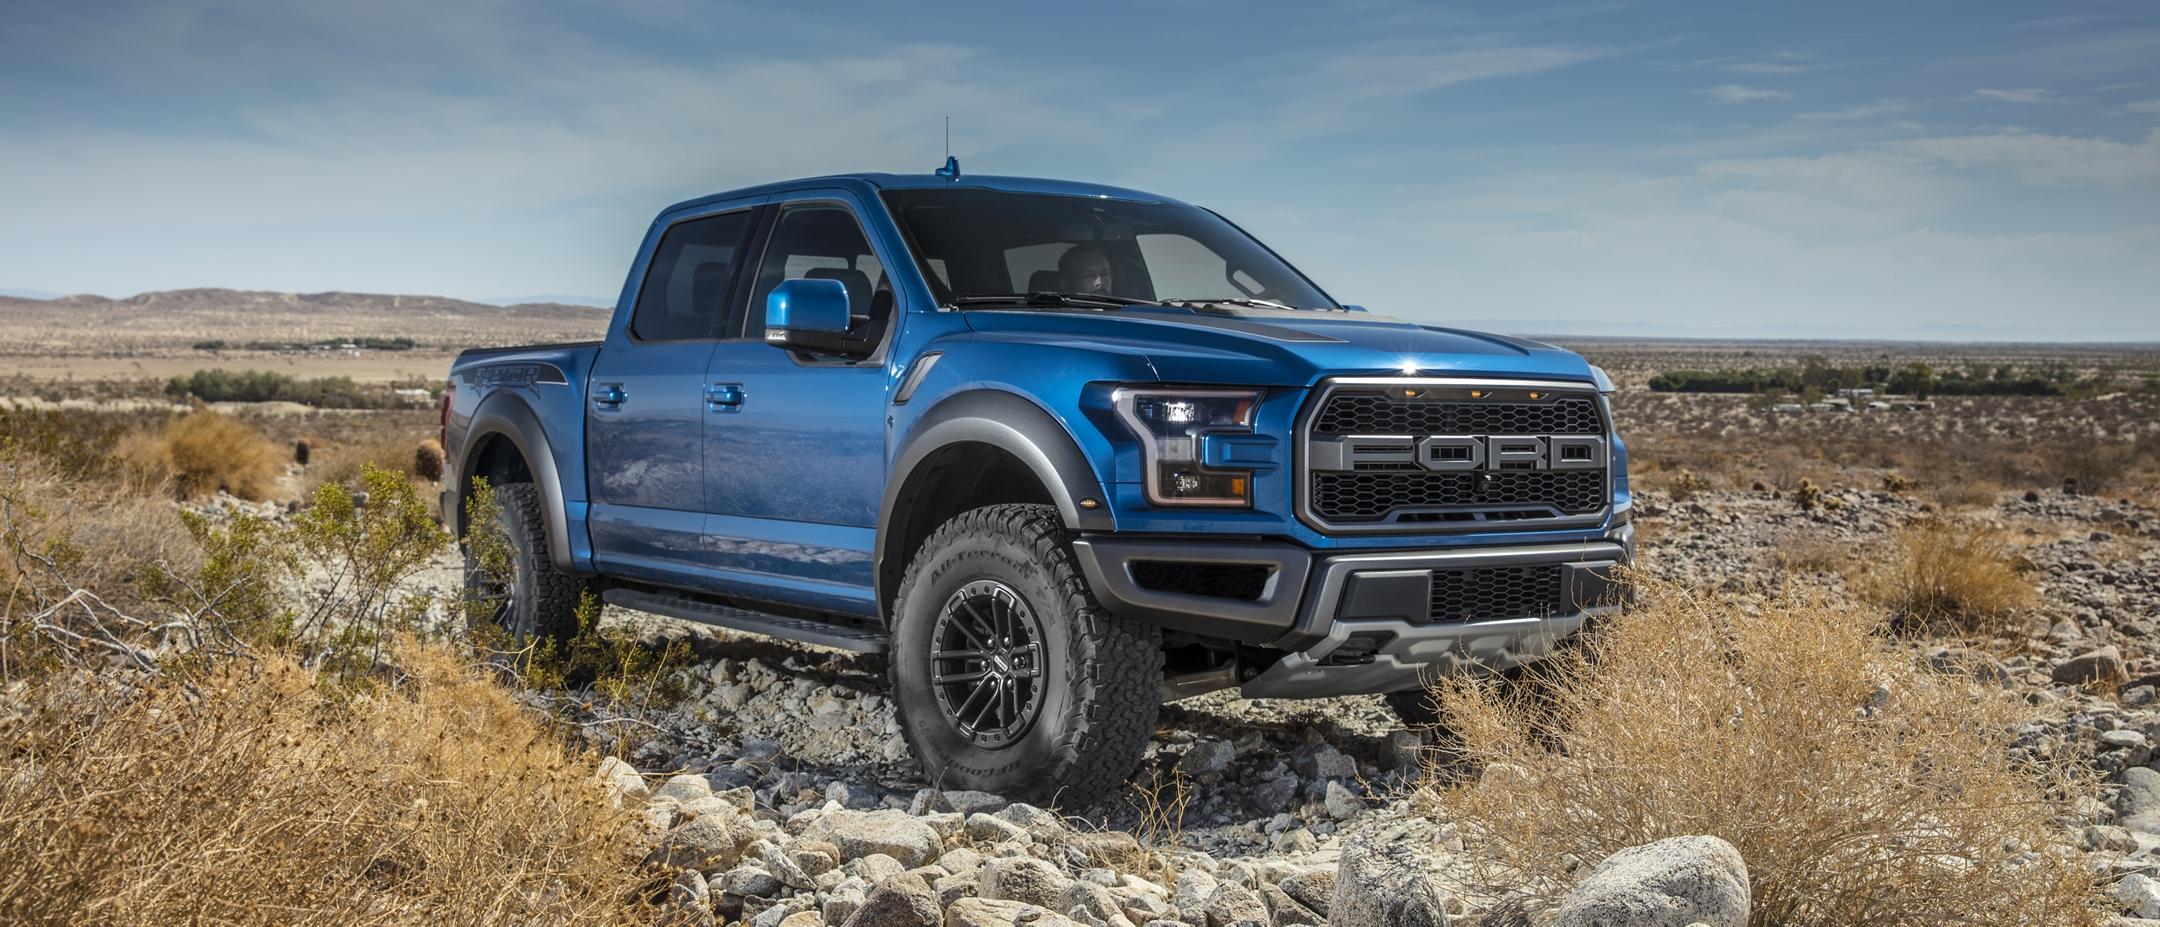 2020 Ford F-150 Truck raptor